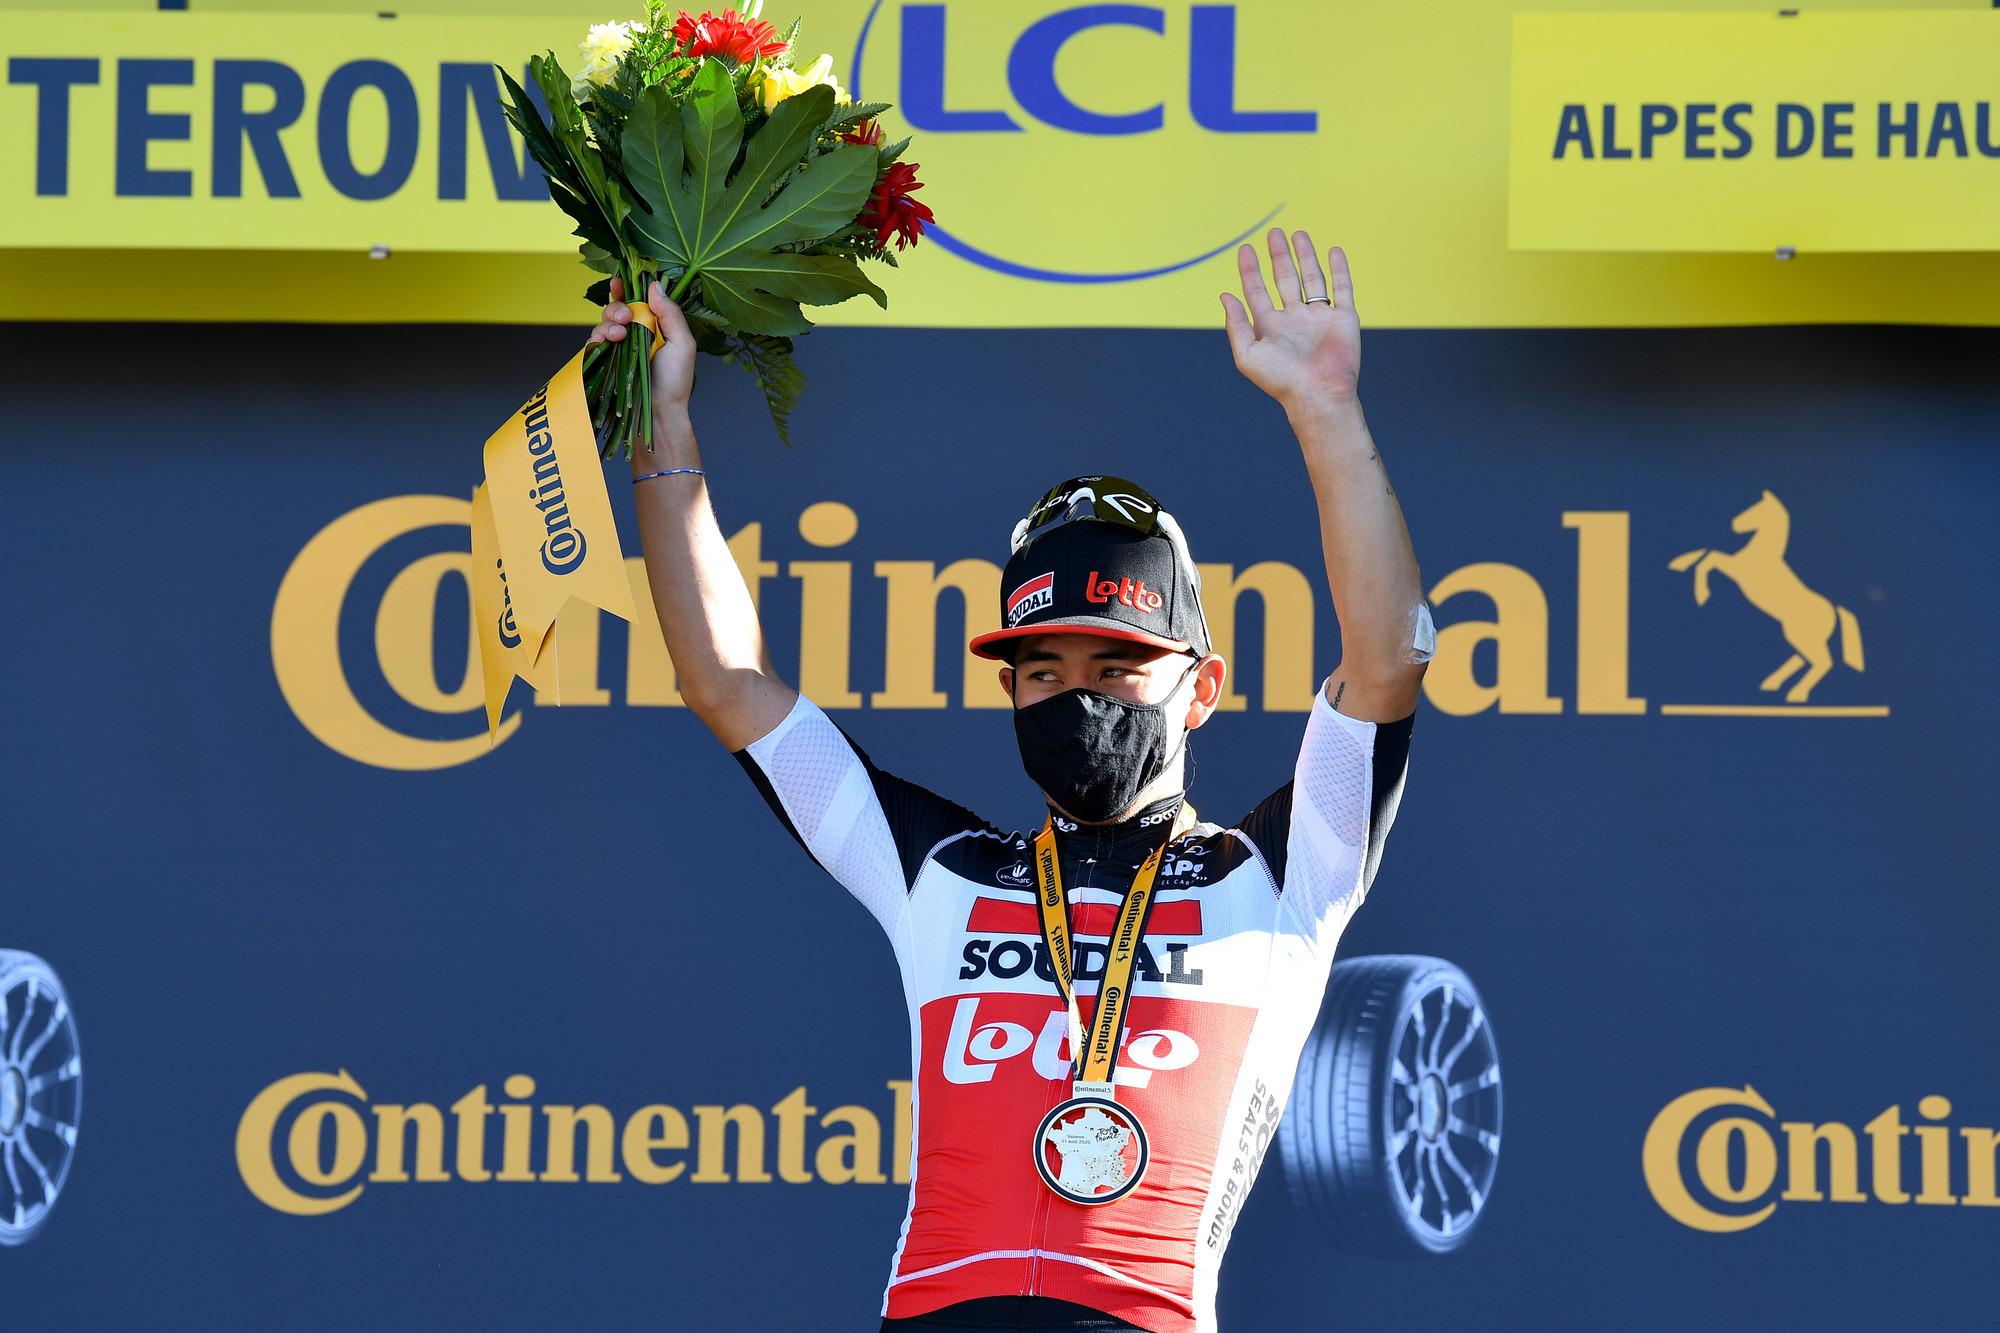 Tour de France 2020 107th Edition 3rd stage Nice Sisteron 198 km 31082020 Caleb Ewan AUS Lotto Soudal photo POOL David StockmanBelgaBettiniPhoto2020